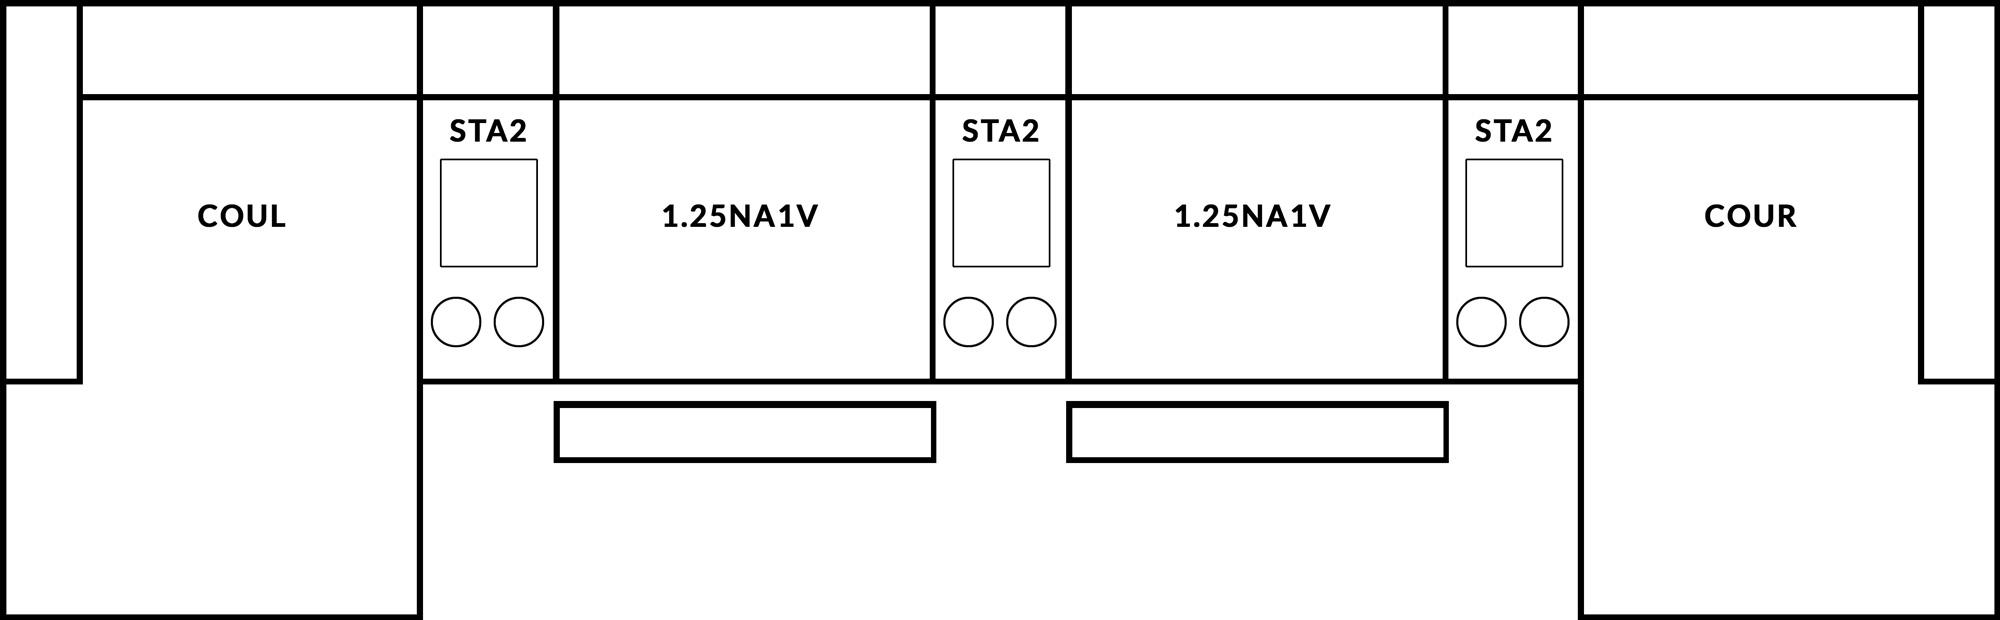 FrontRow™ Luno 4 seat straight Option 5